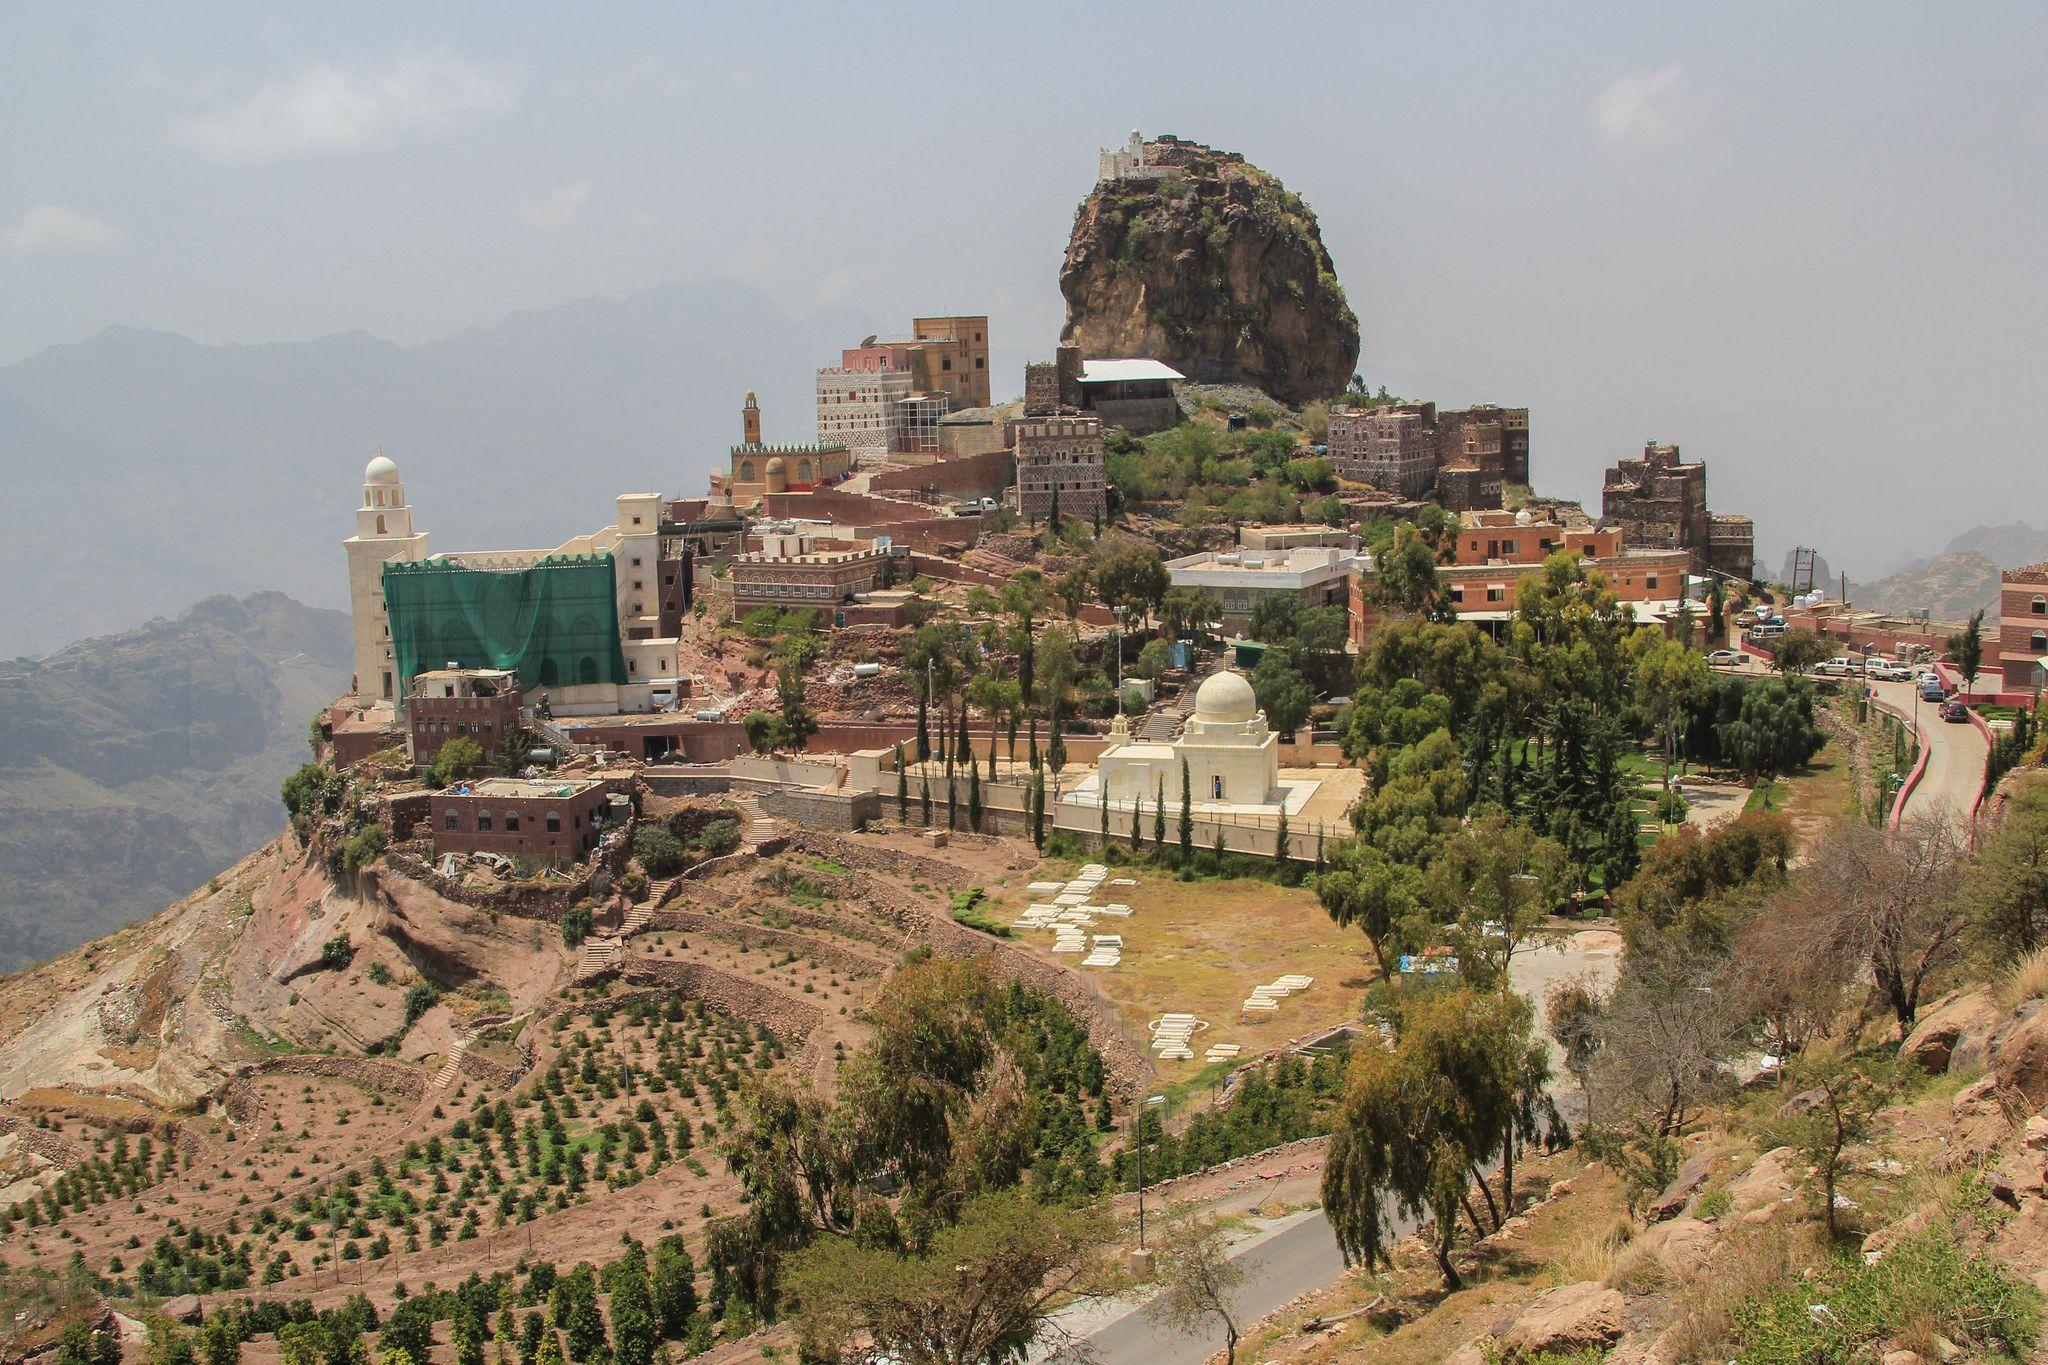 Jabal Haraz